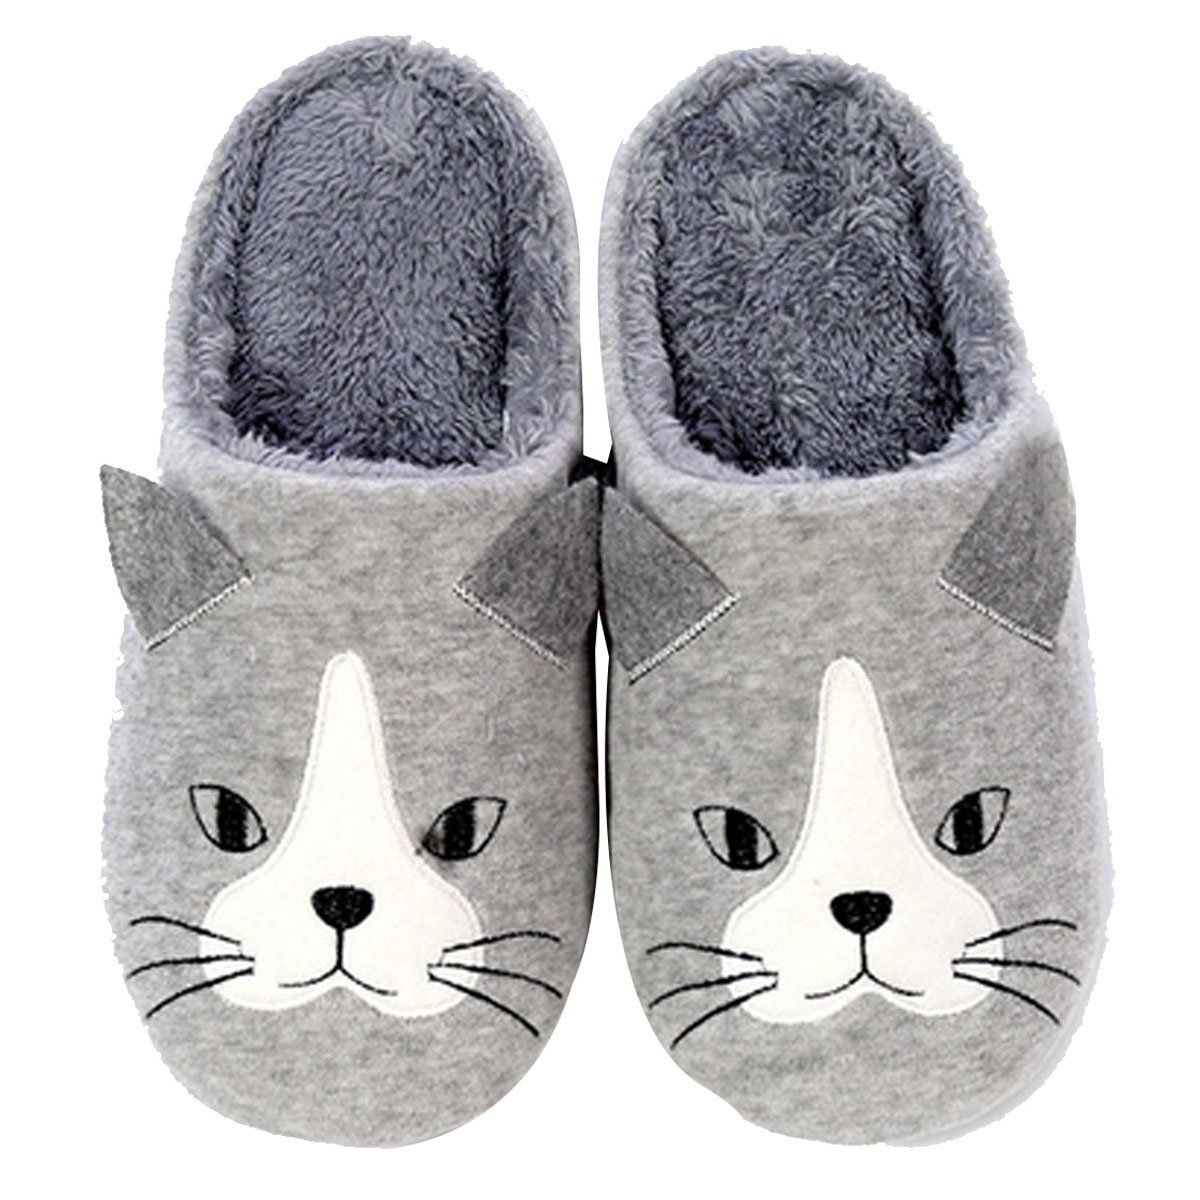 Children Cat Dog Pattern Winter Slippers Anti-Slip Home Slippers Bedroom Shoes(Light Grey, 2XS)